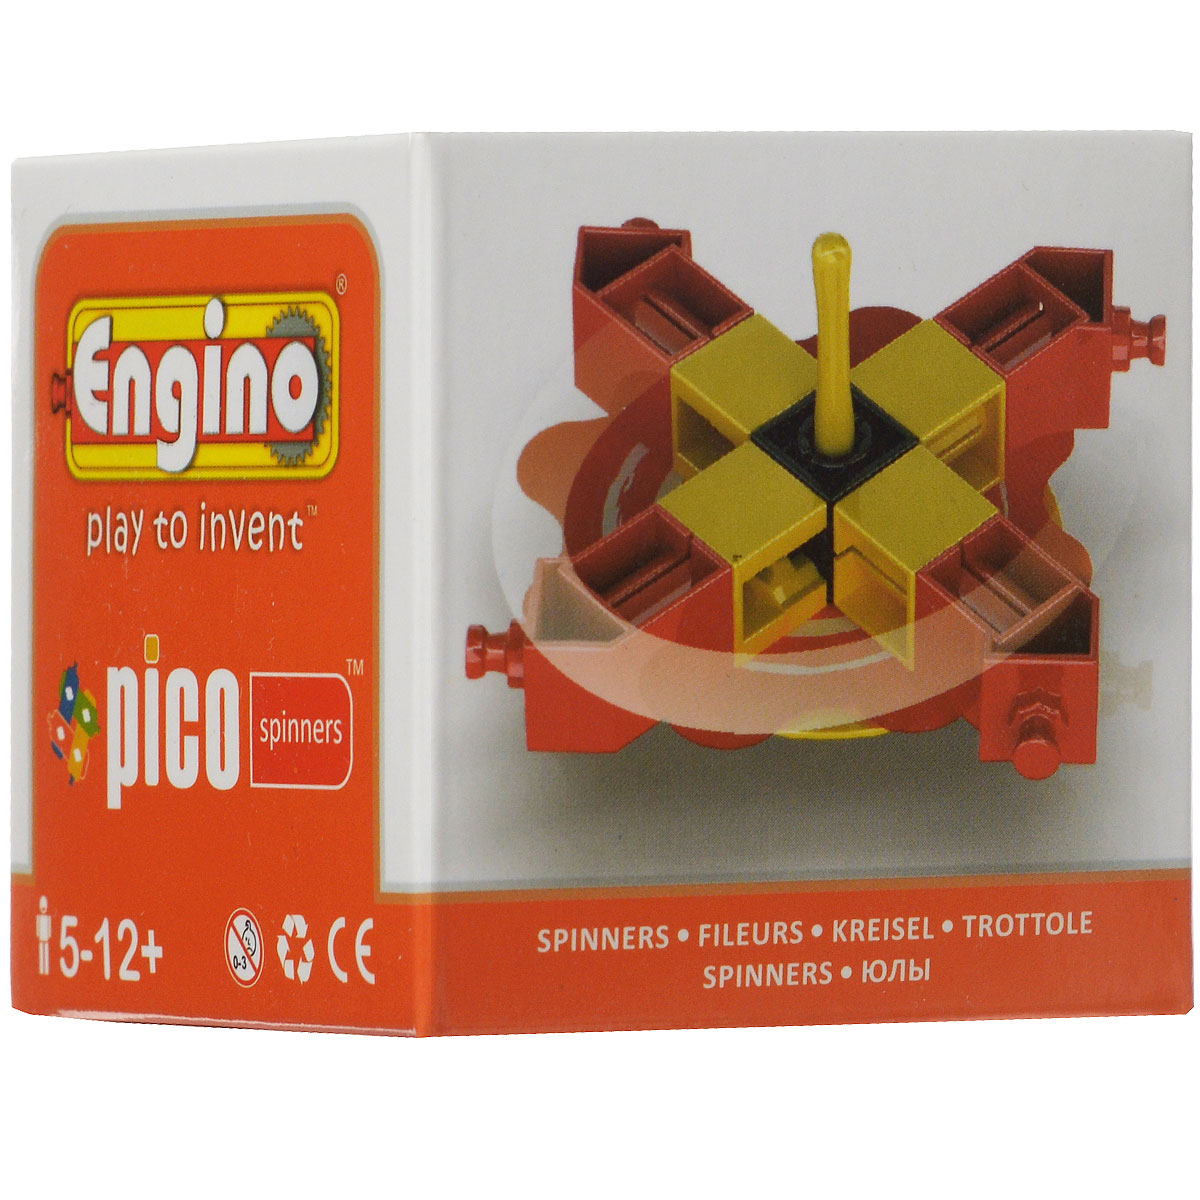 Engino Конструктор Spinners PS04 engino конструктор inventor приключения 170 элементов